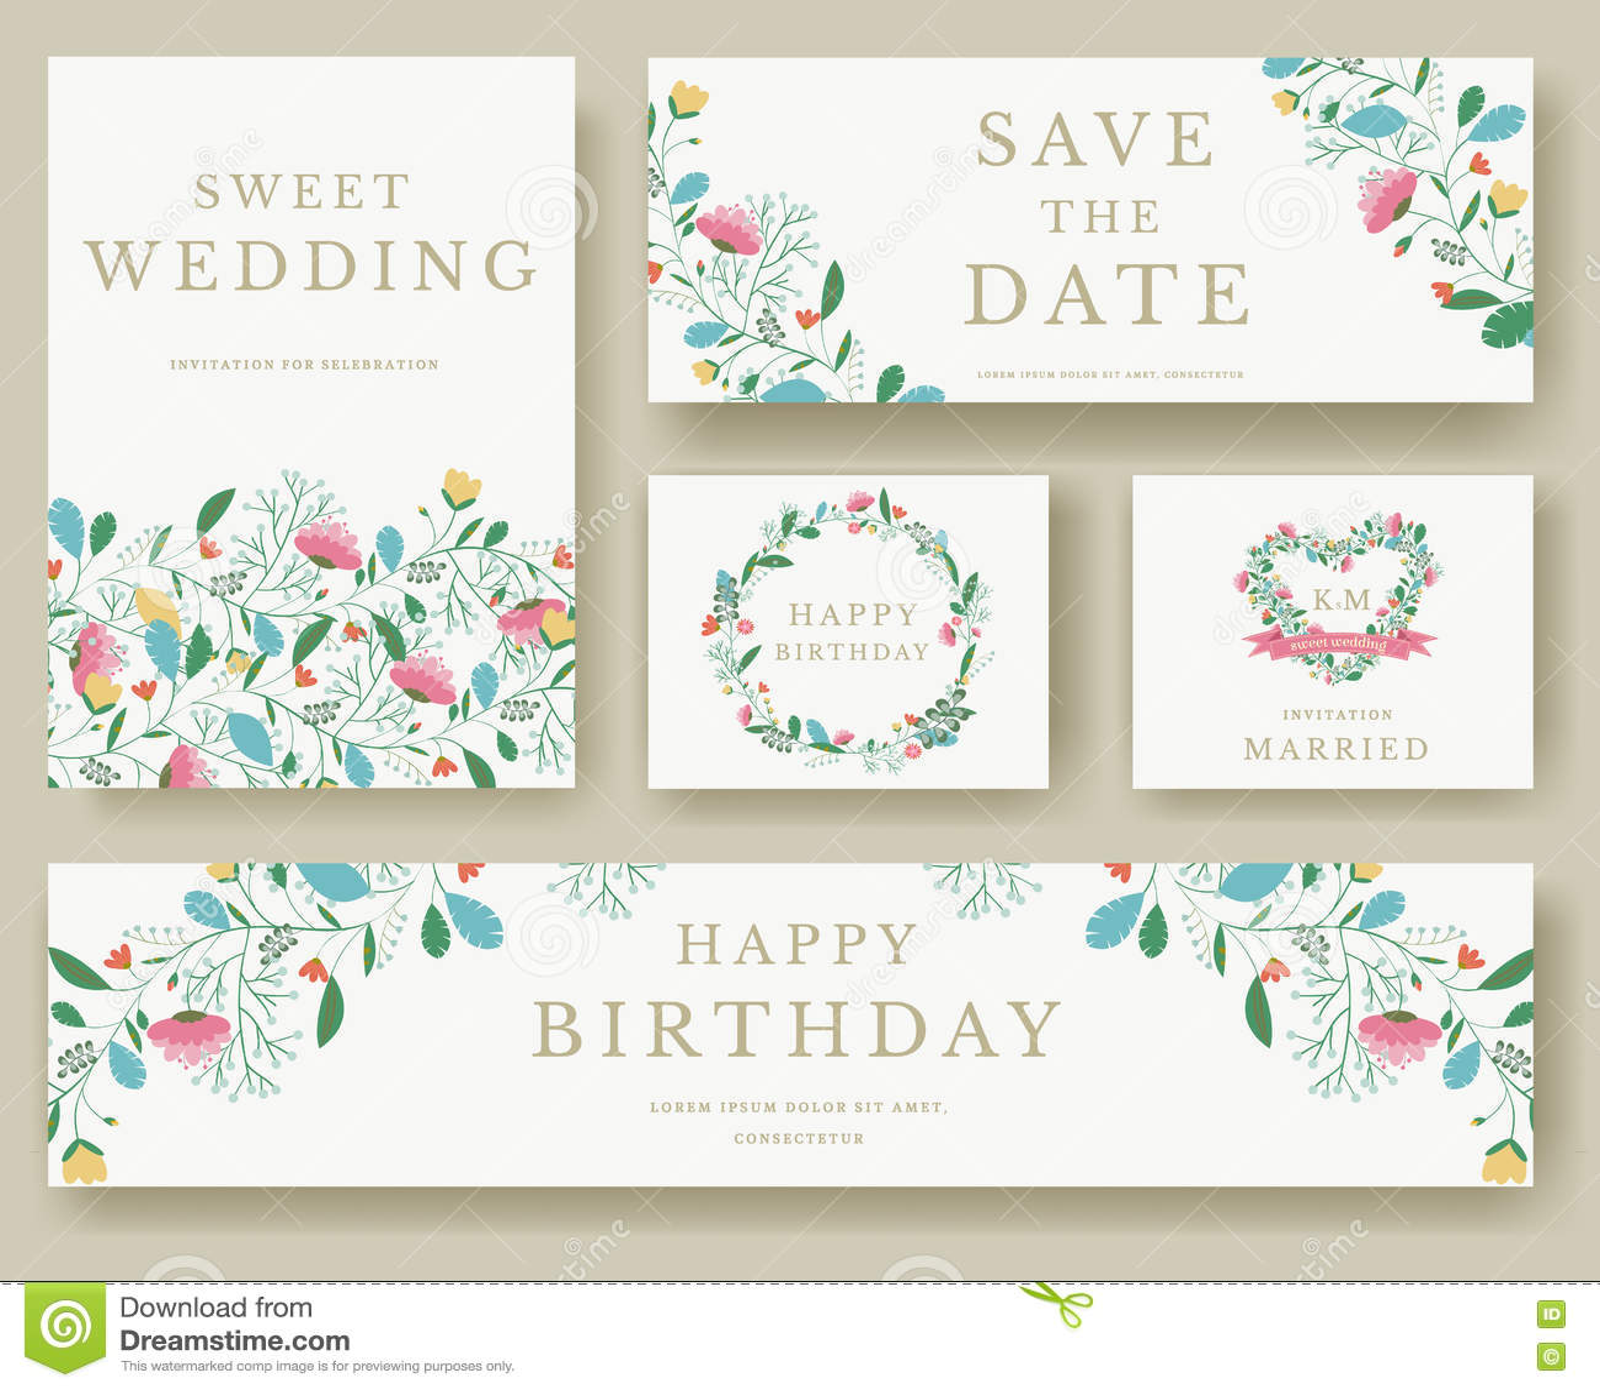 Flowers Vector Design Wedding Invitations Wedding: Set Of Flower Invitation Cards. Colorful Greeting Wedding